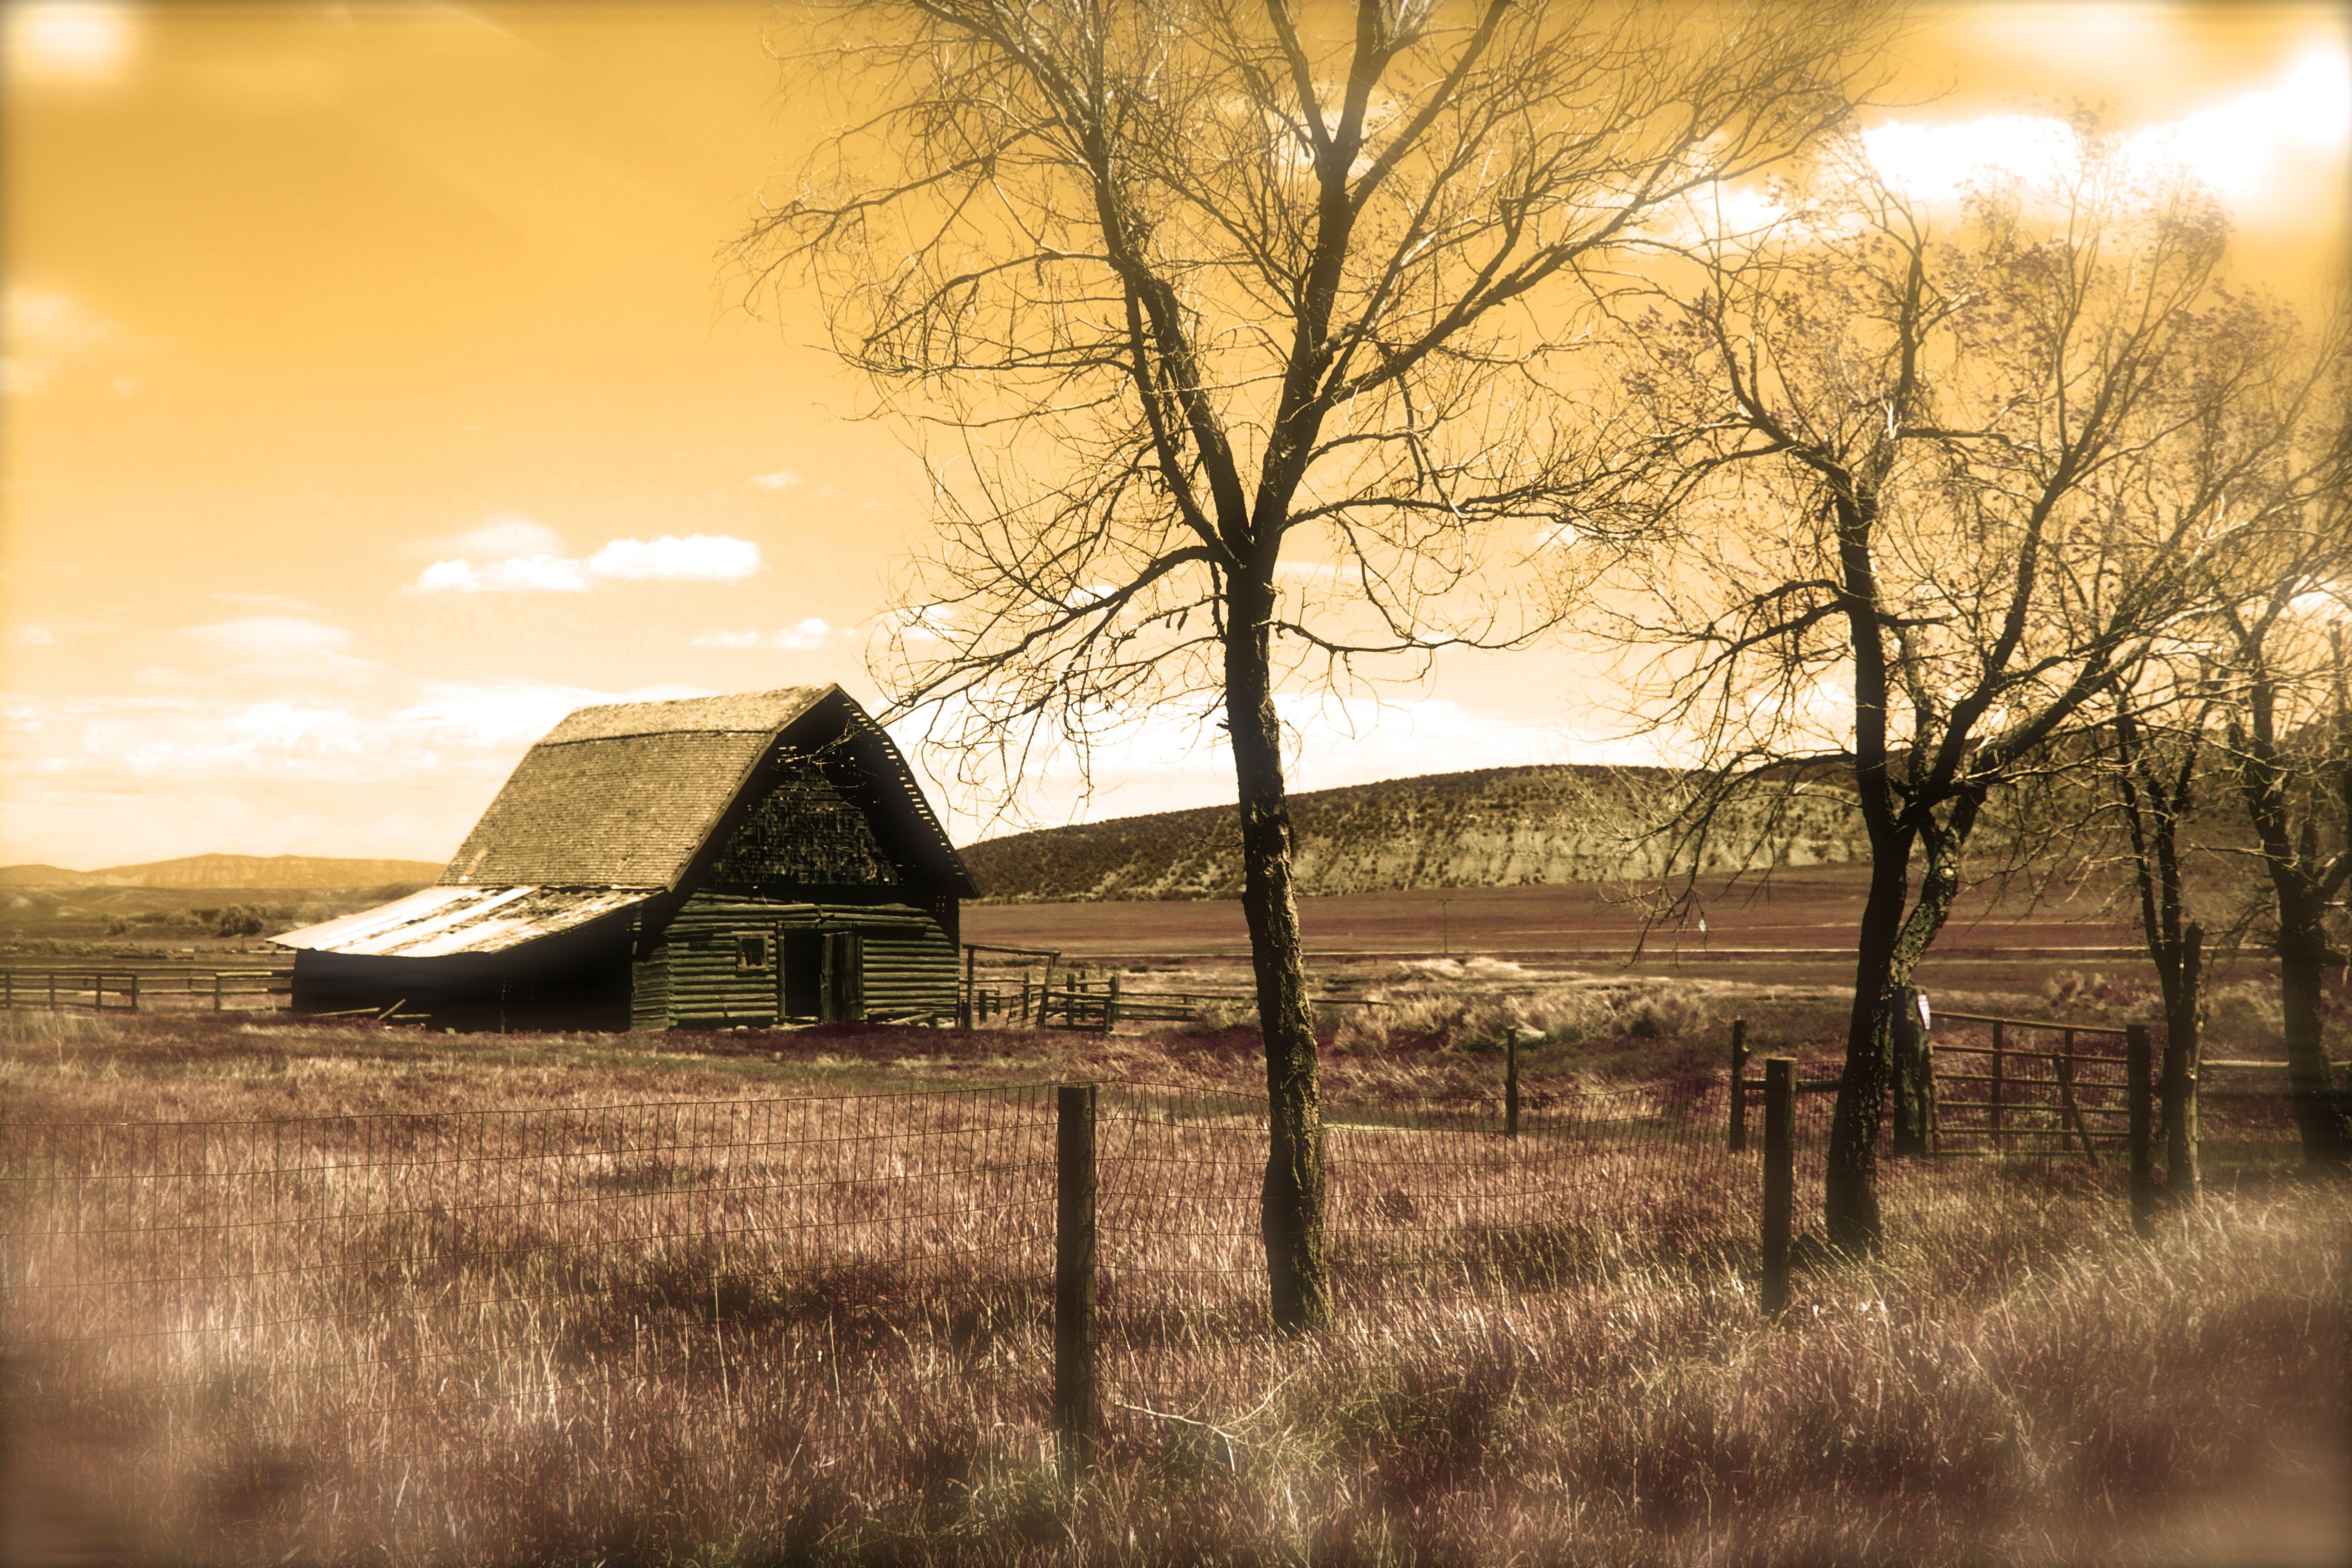 Barn CoWyo